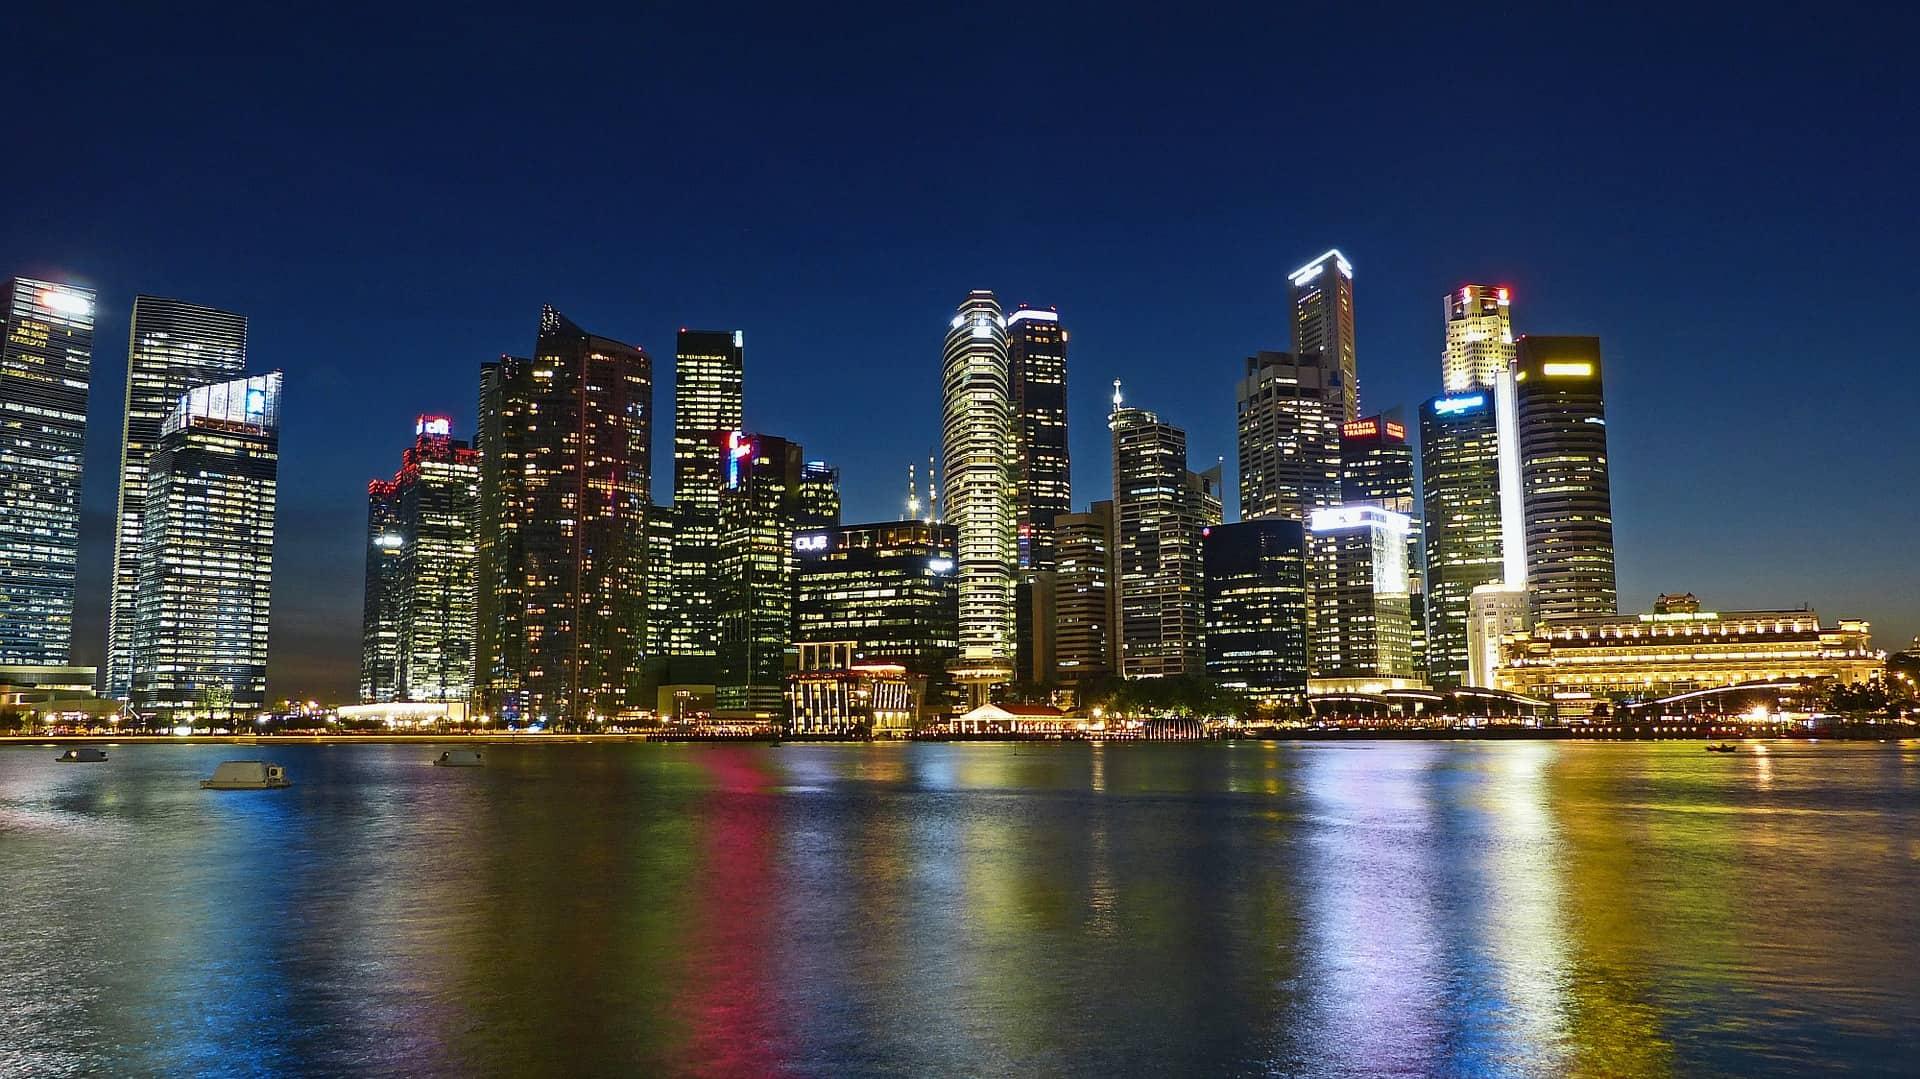 singapore river at night